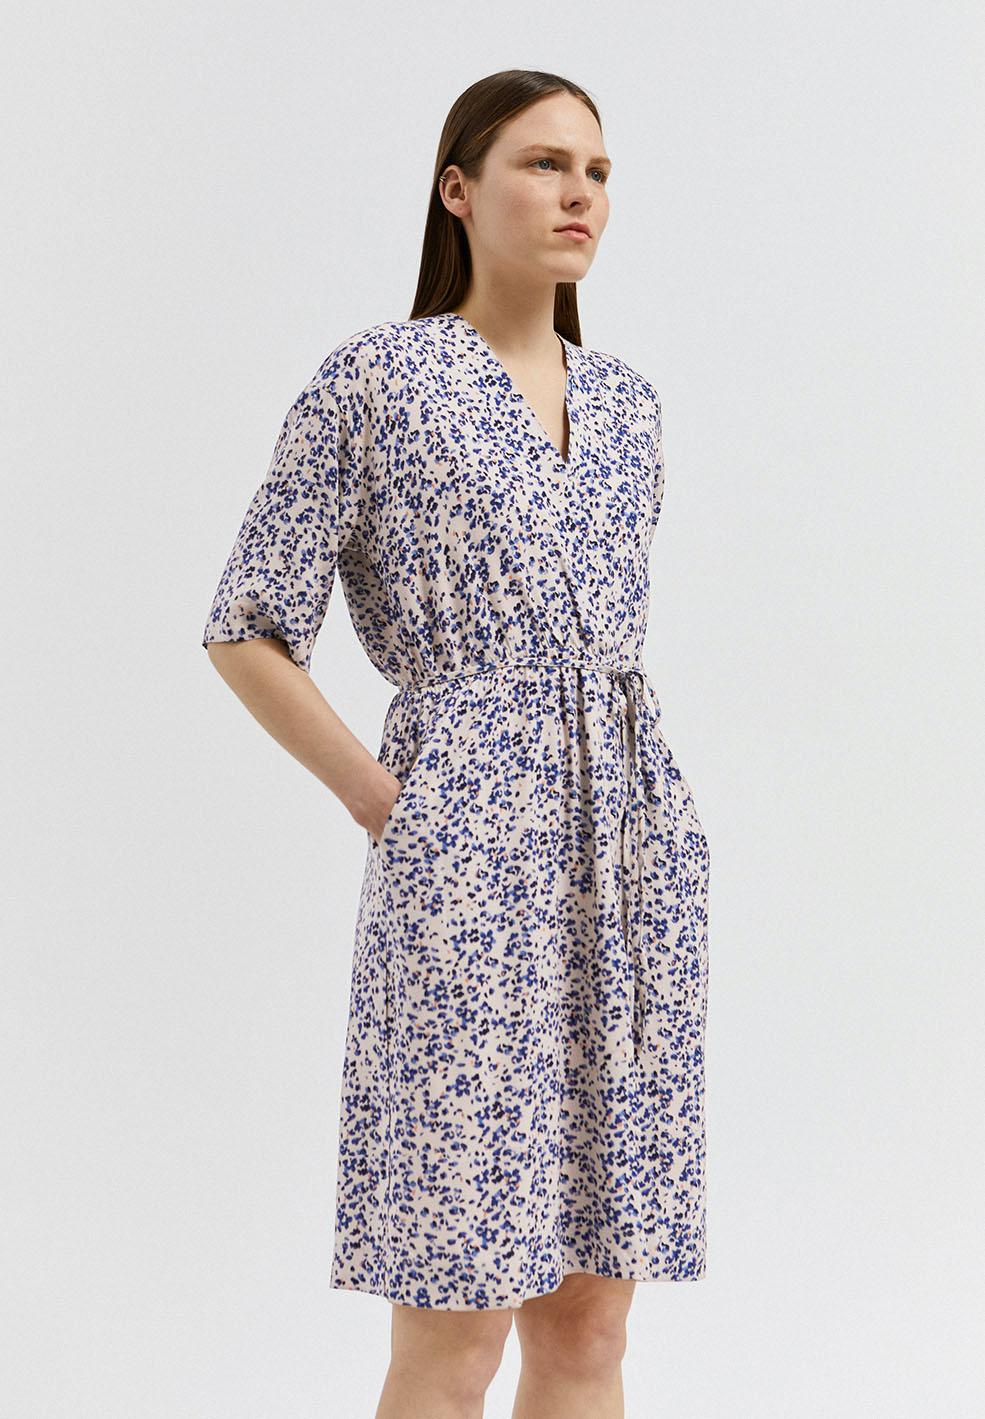 RAUHAA FLOWER SPRINKLE Dress made of LENZING™ ECOVERO™